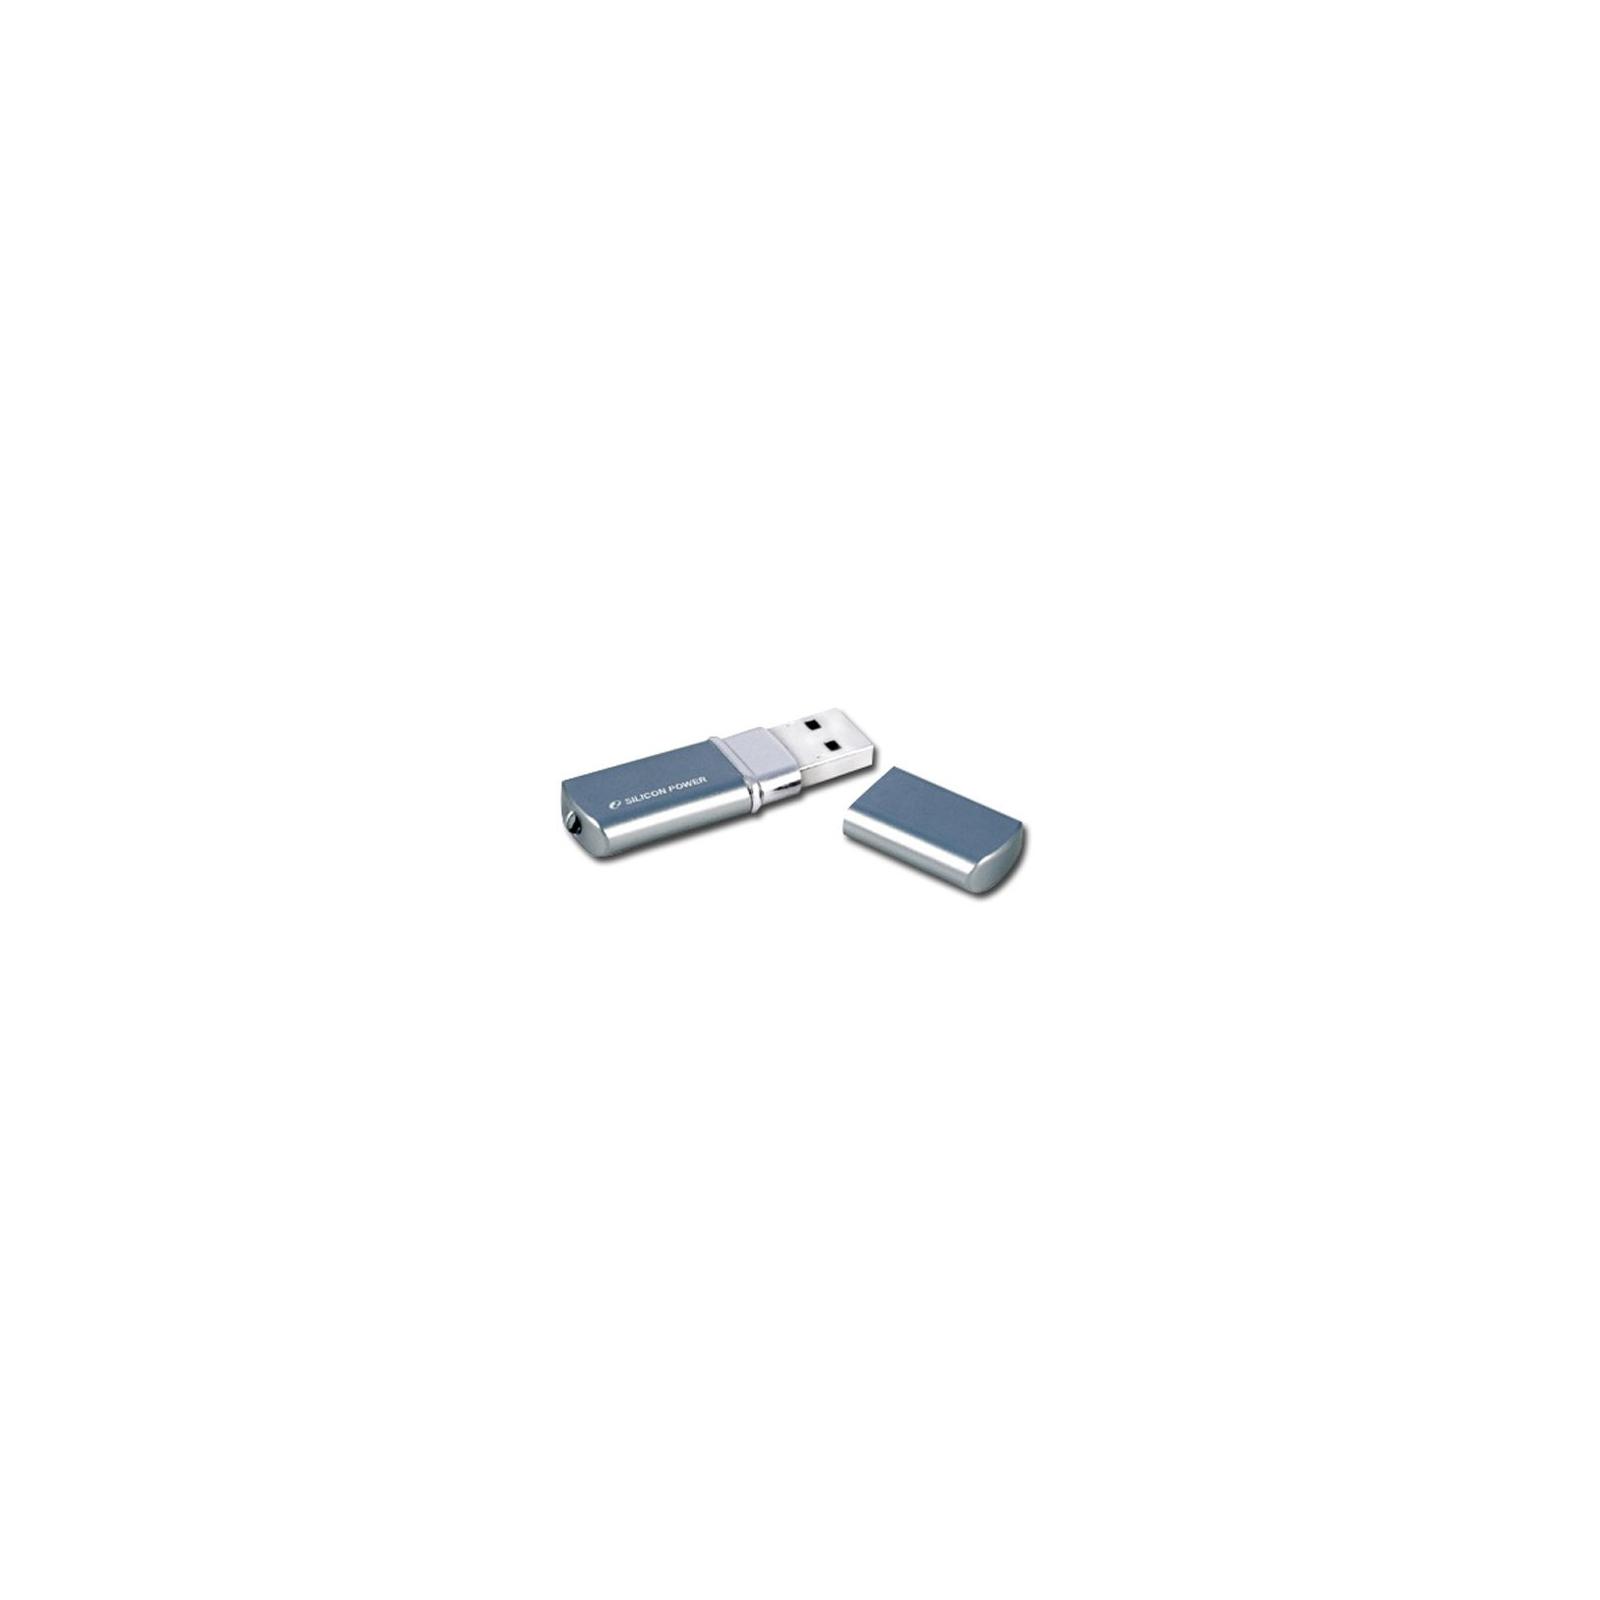 USB флеш накопитель Silicon Power 16Gb LuxMini 720 deep blue (SP016GBUF2720V1D) изображение 3